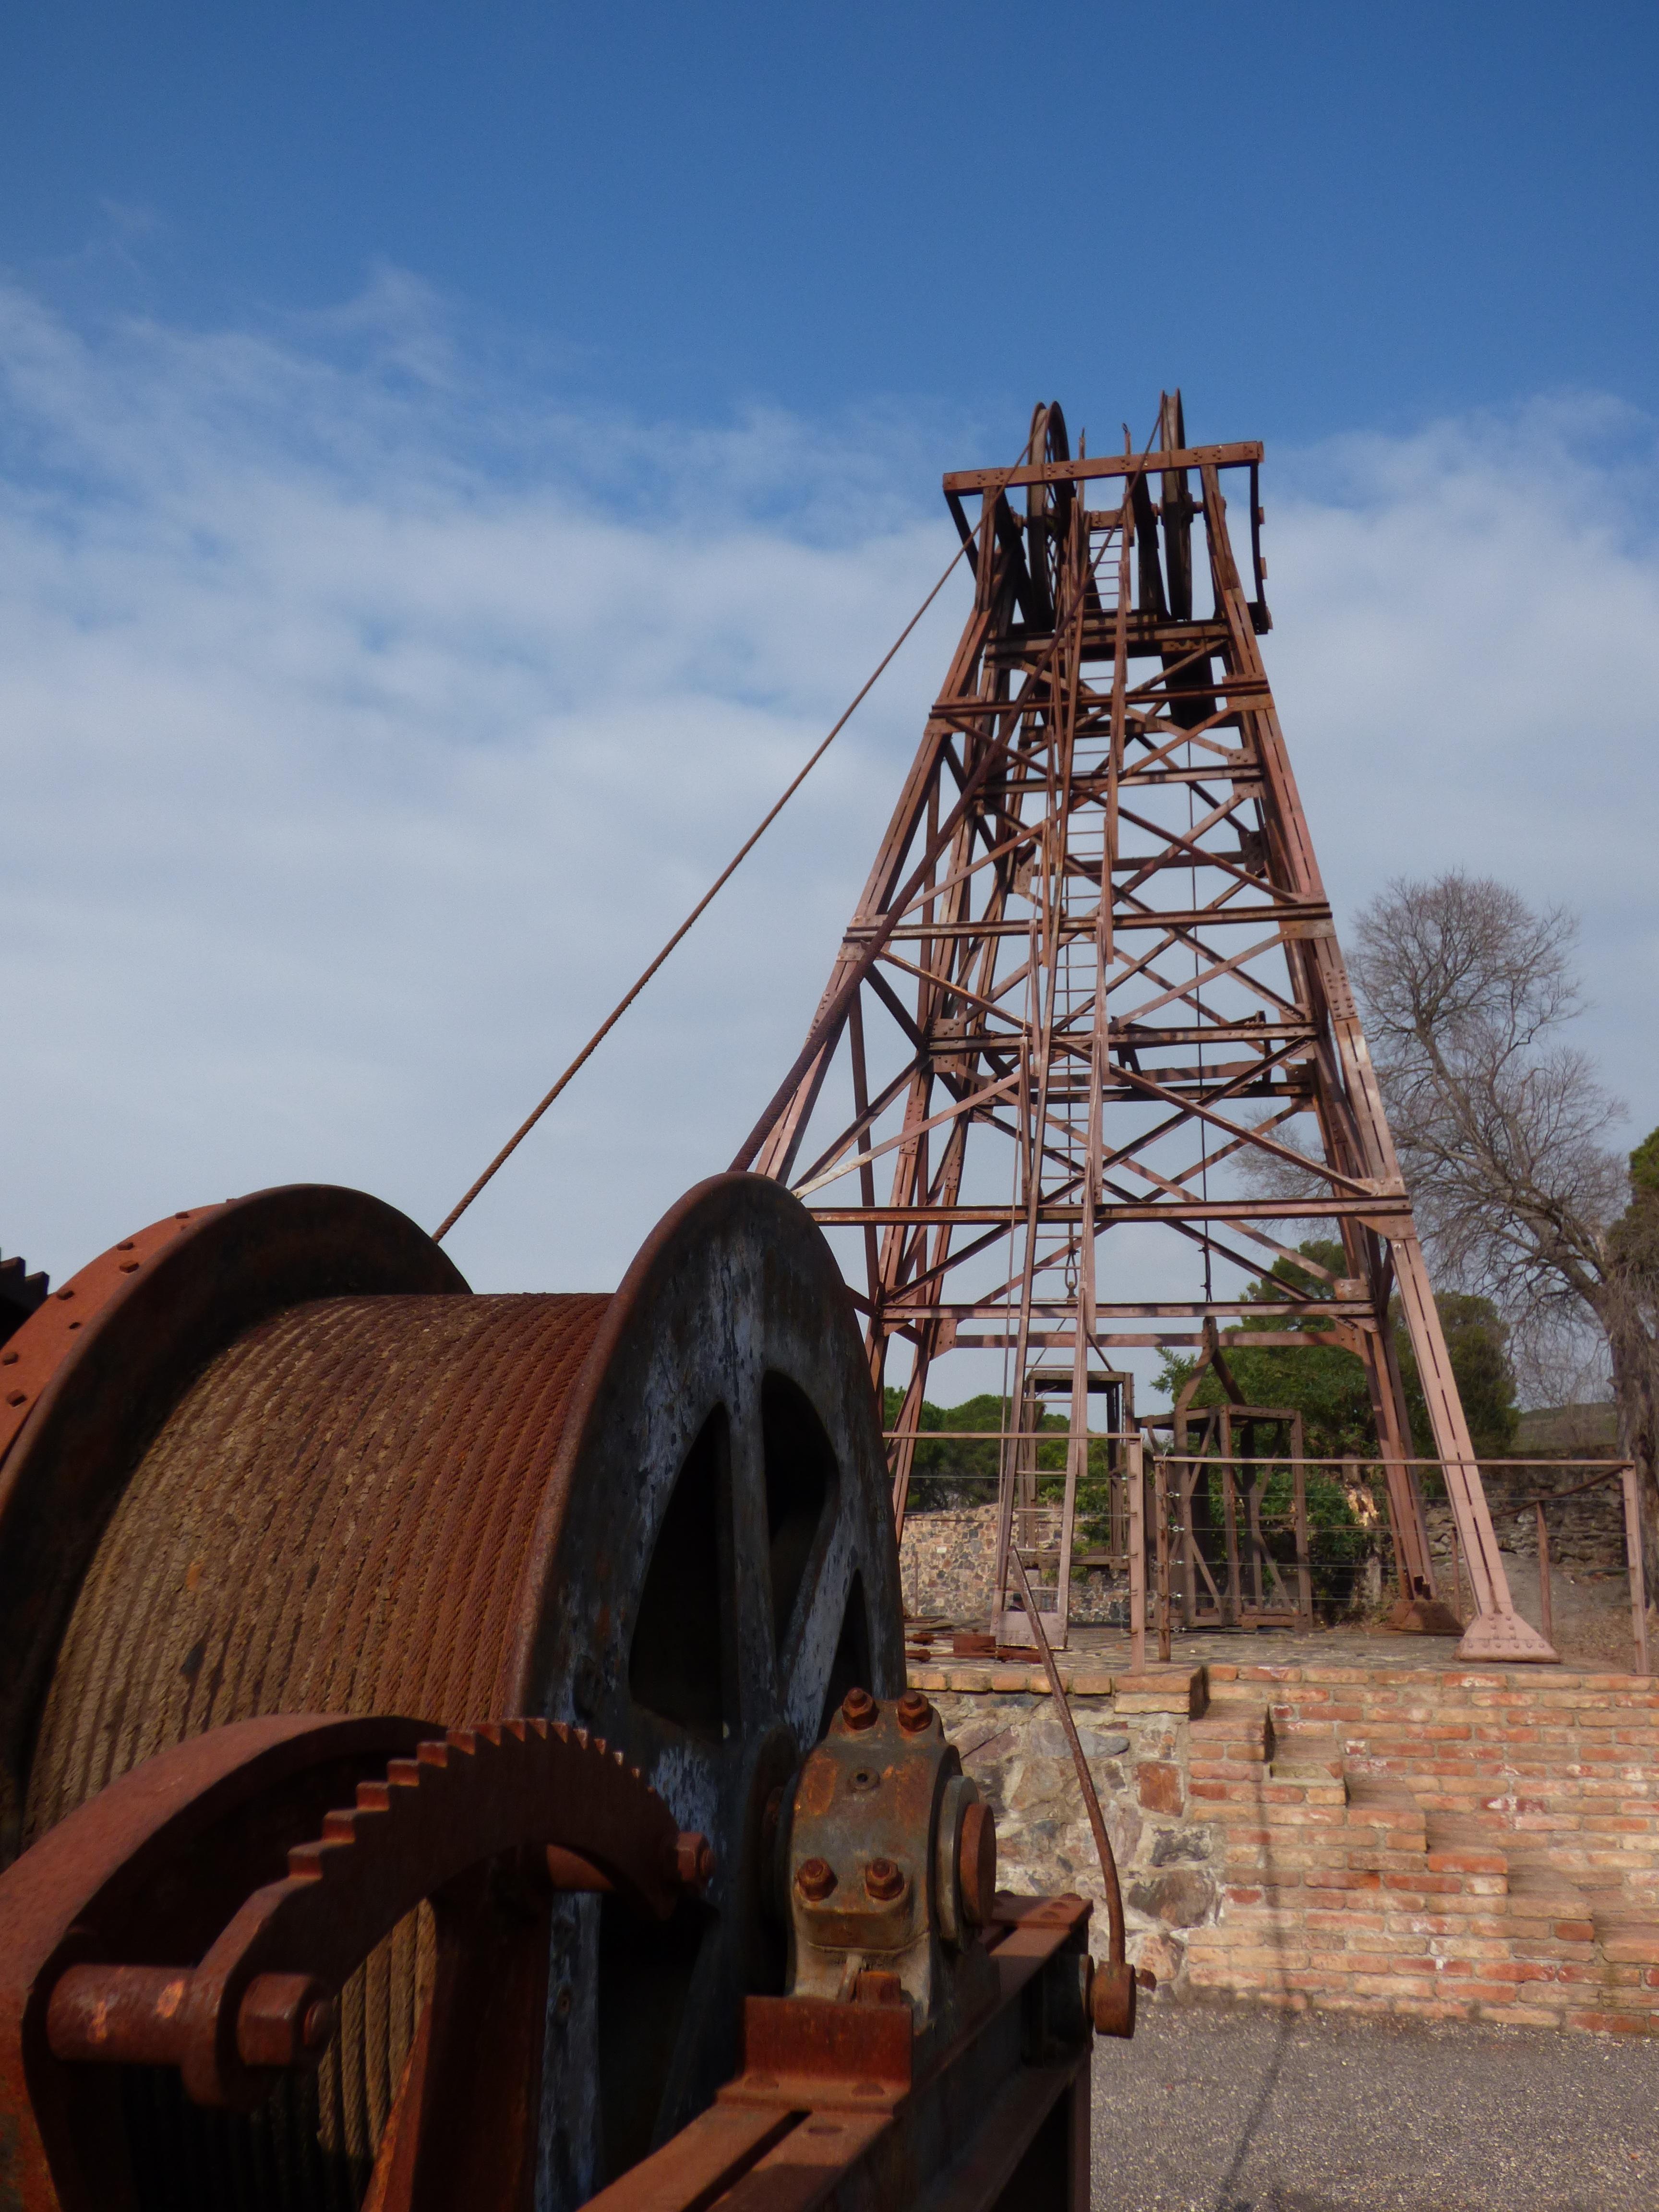 Fotos gratis : madera, vehículo, mástil, bien, ascensor, hierro ...